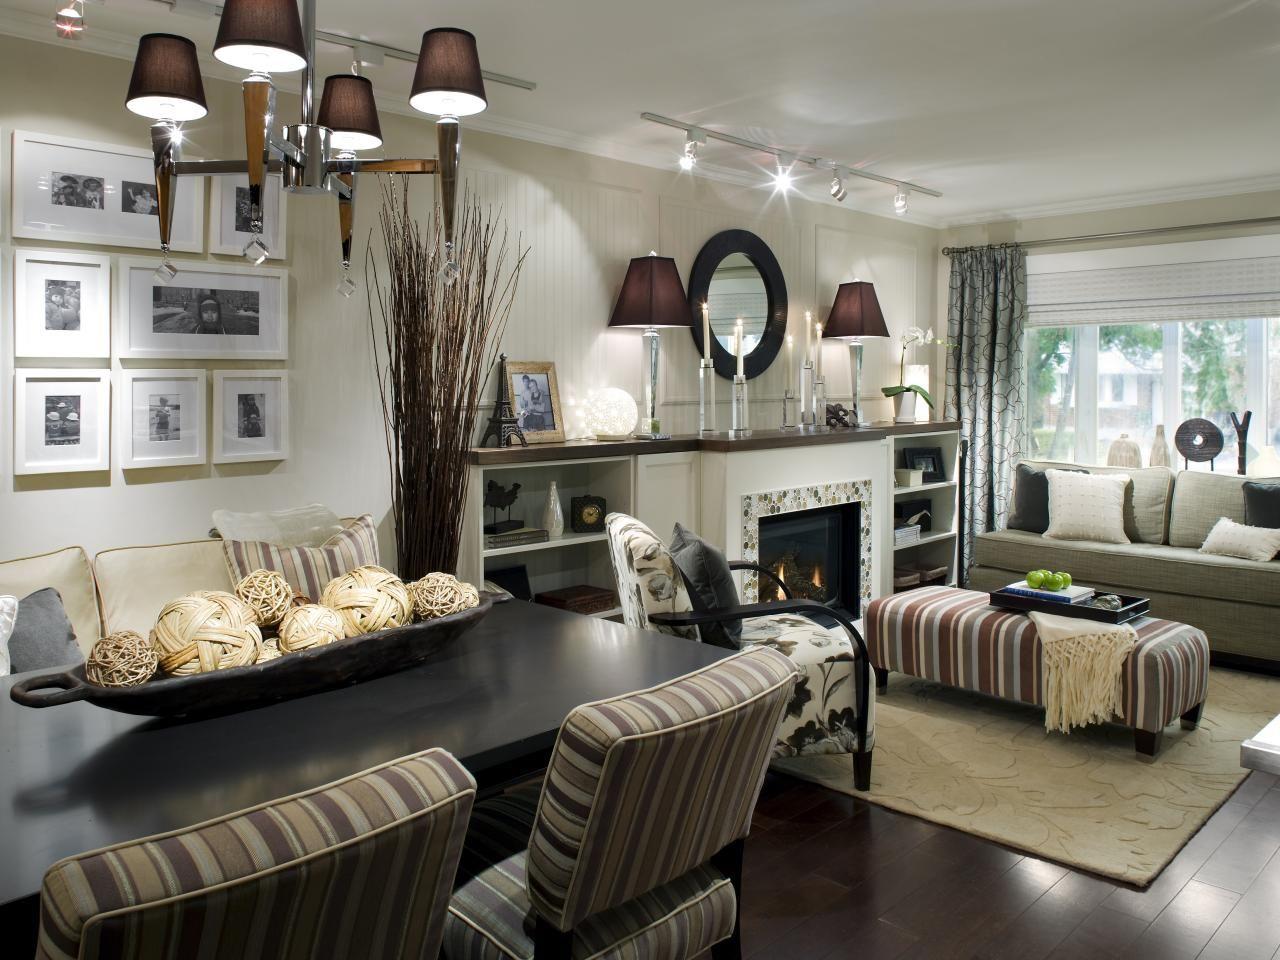 9 fireplace design ideas from candice olson interior design home rh pinterest com